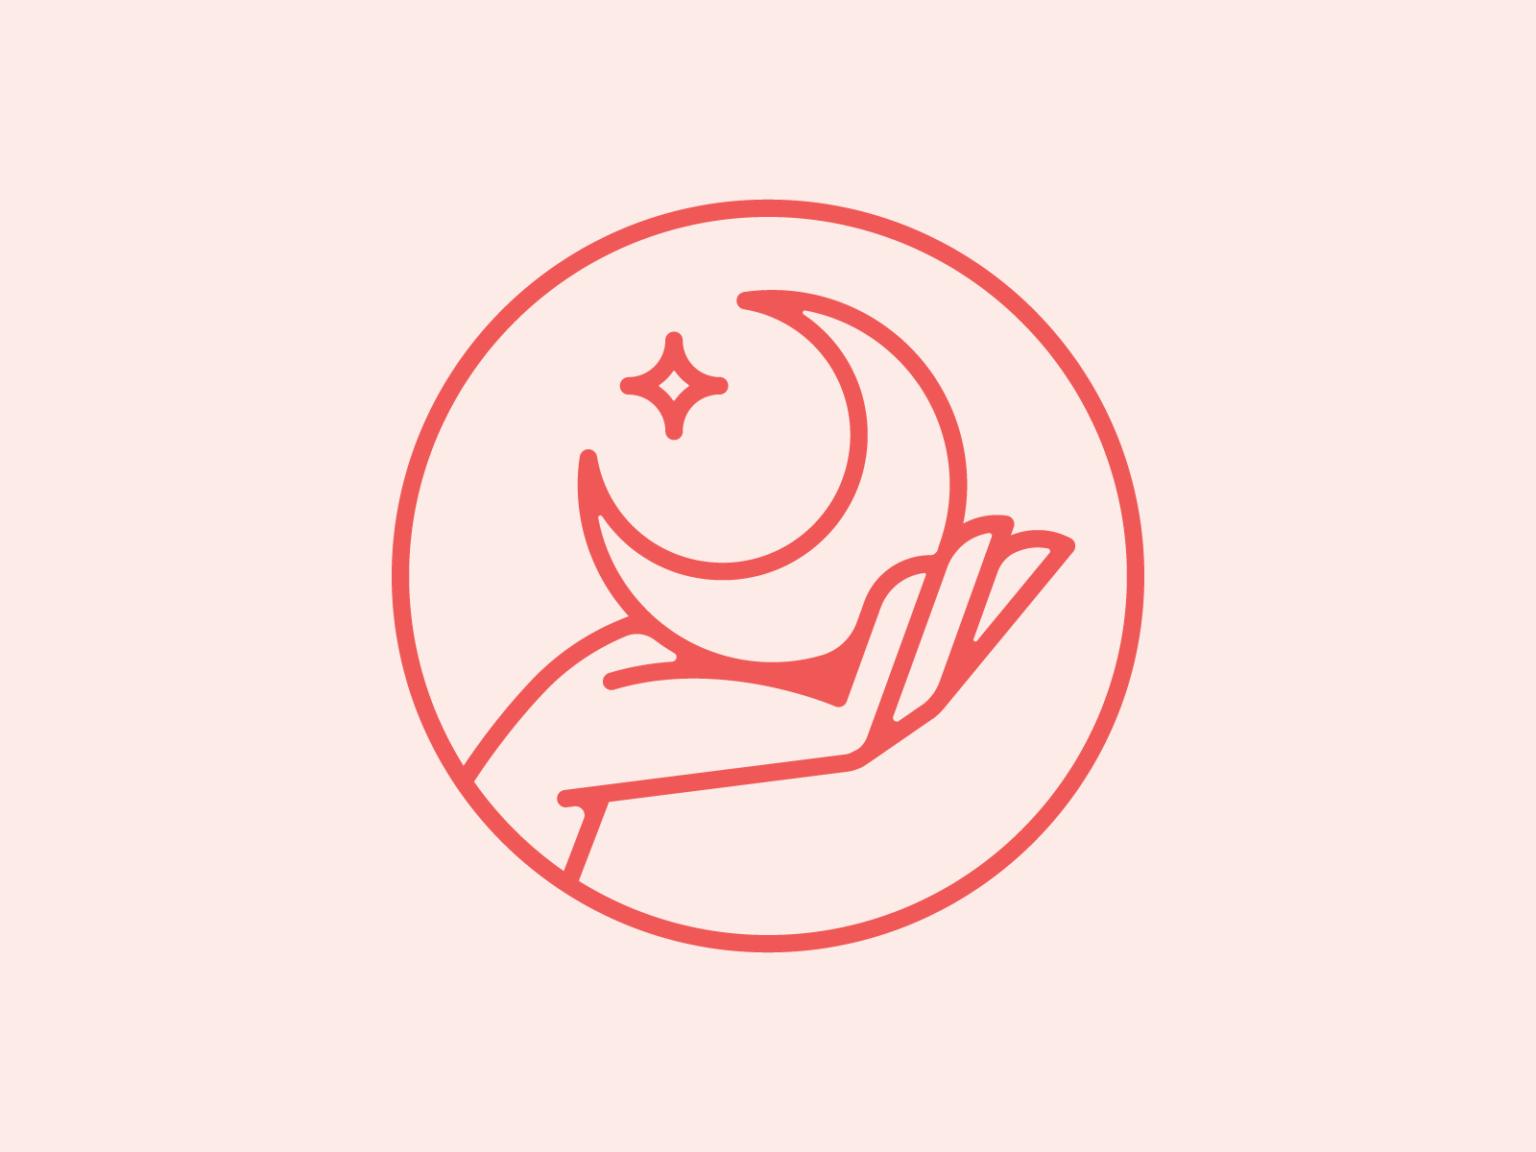 thiet-ke-logo-bee-art-21